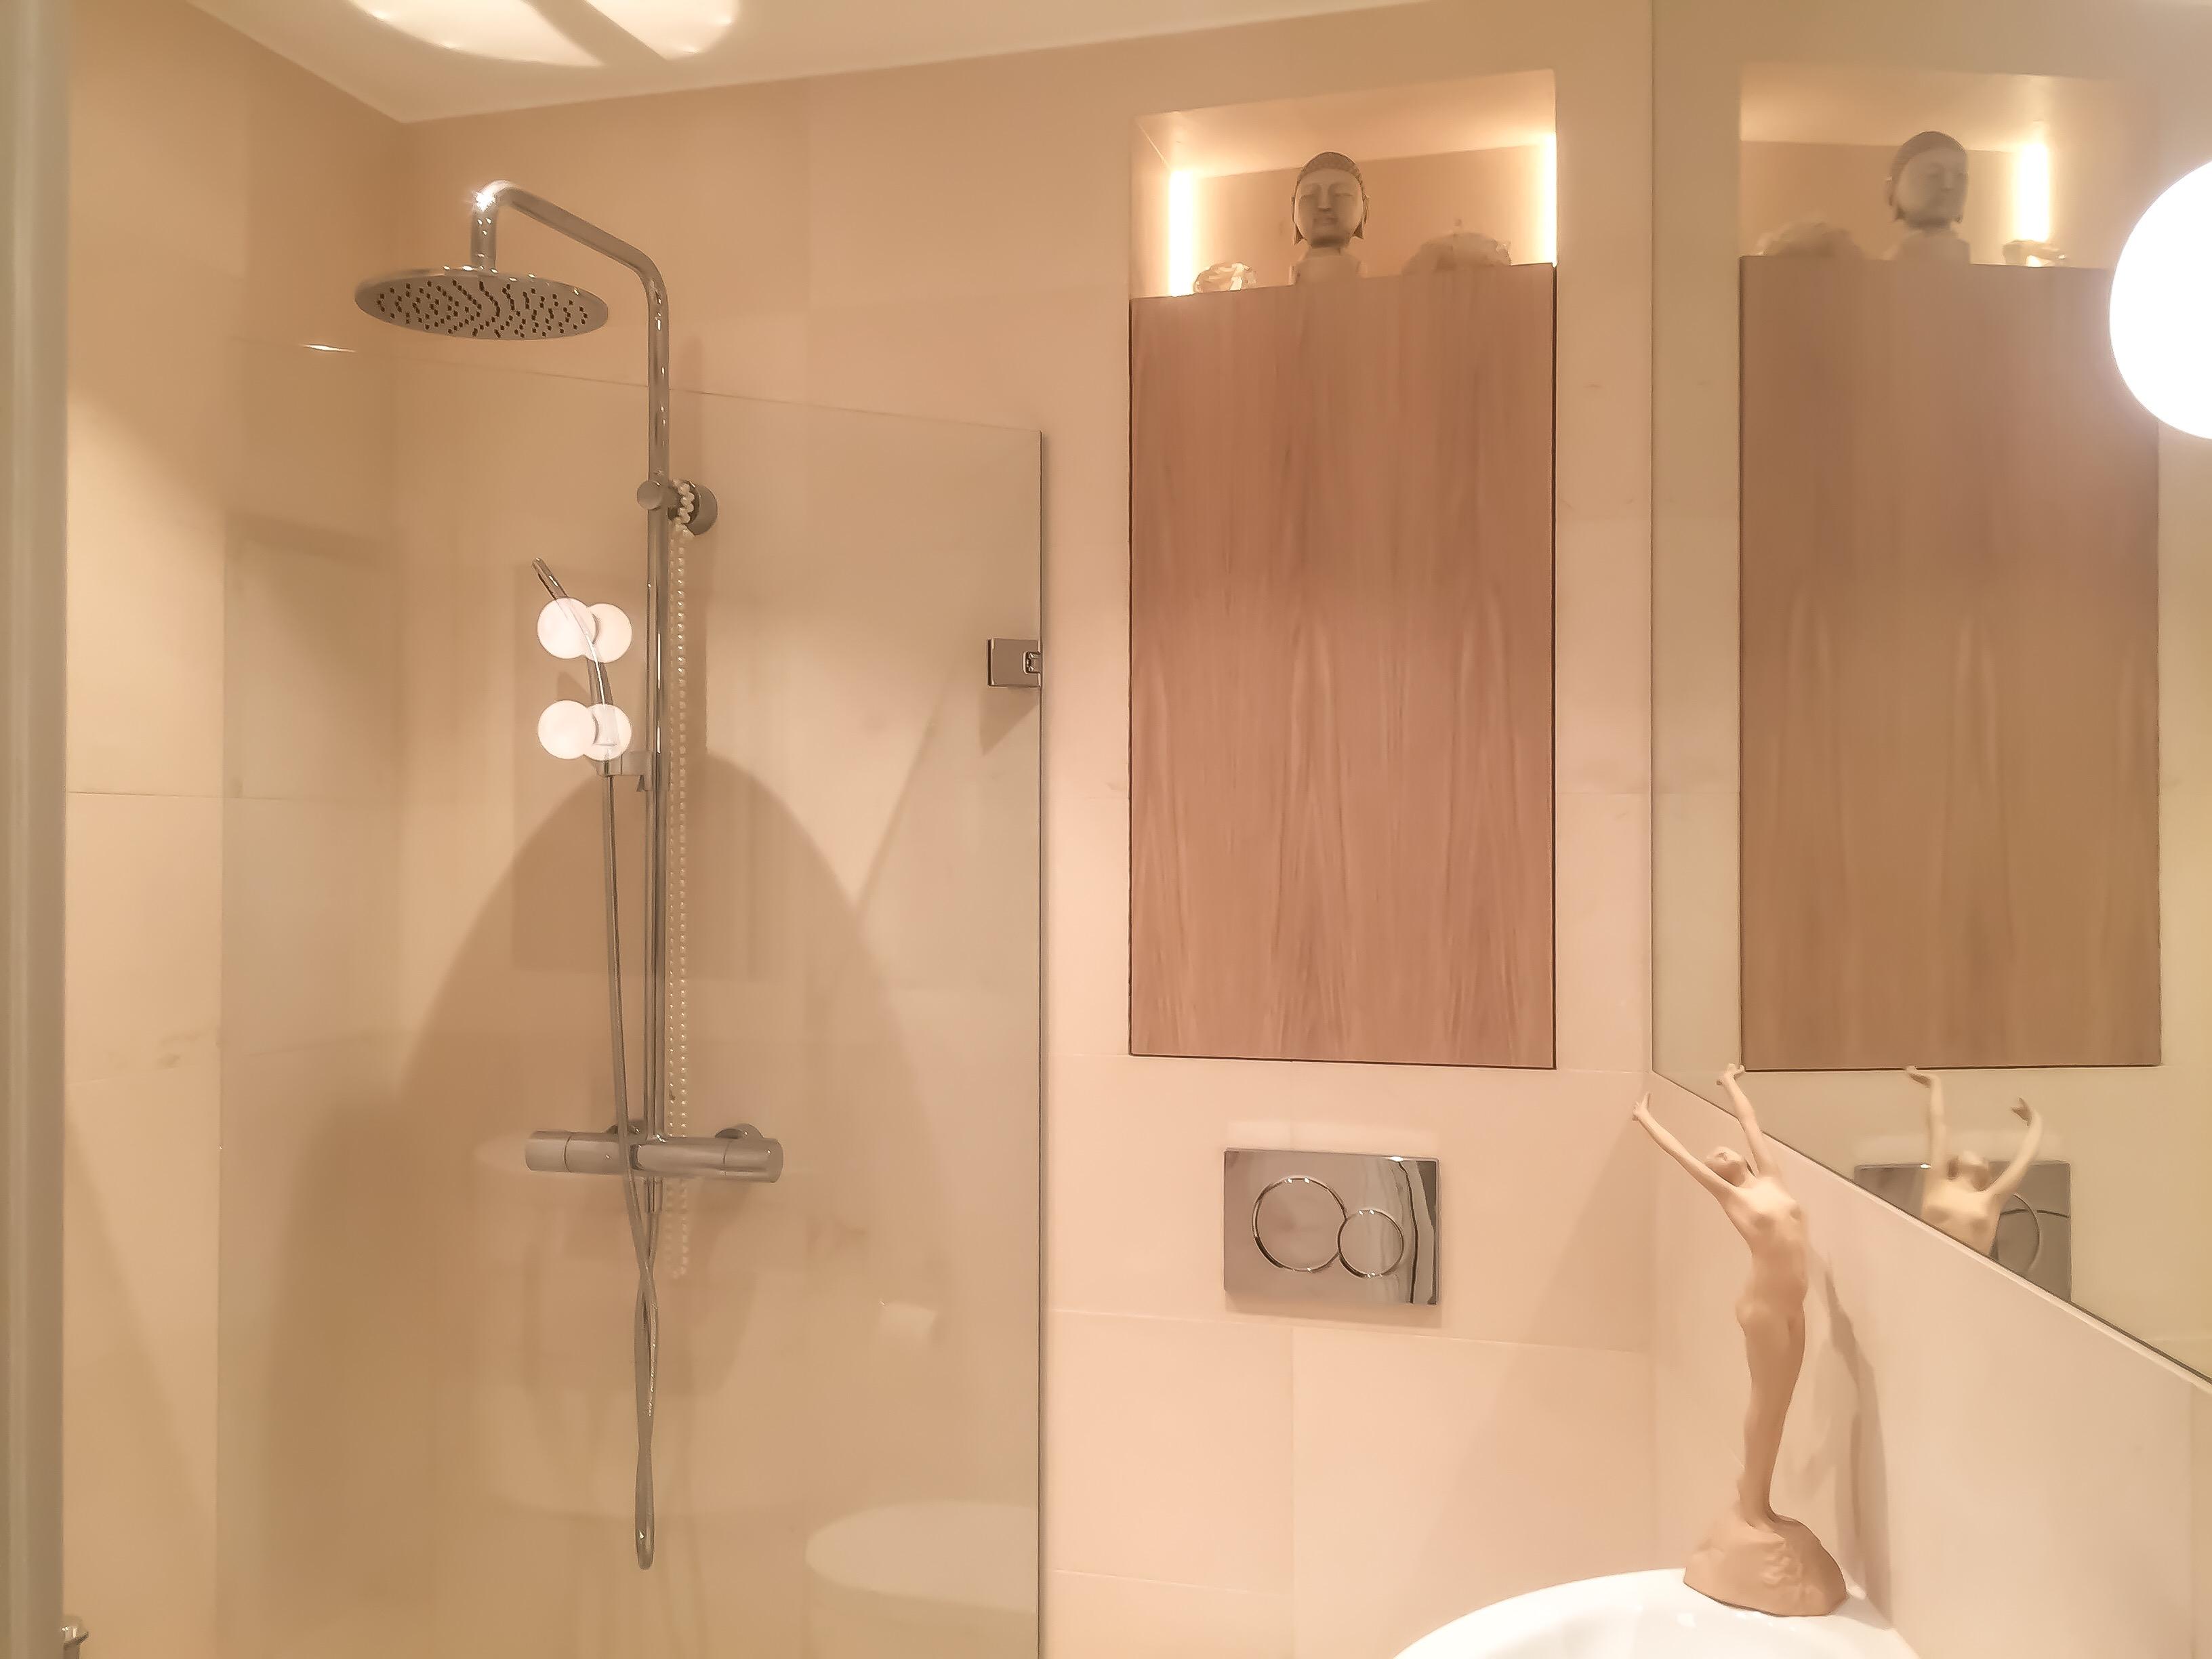 glassdør-bad-dusj